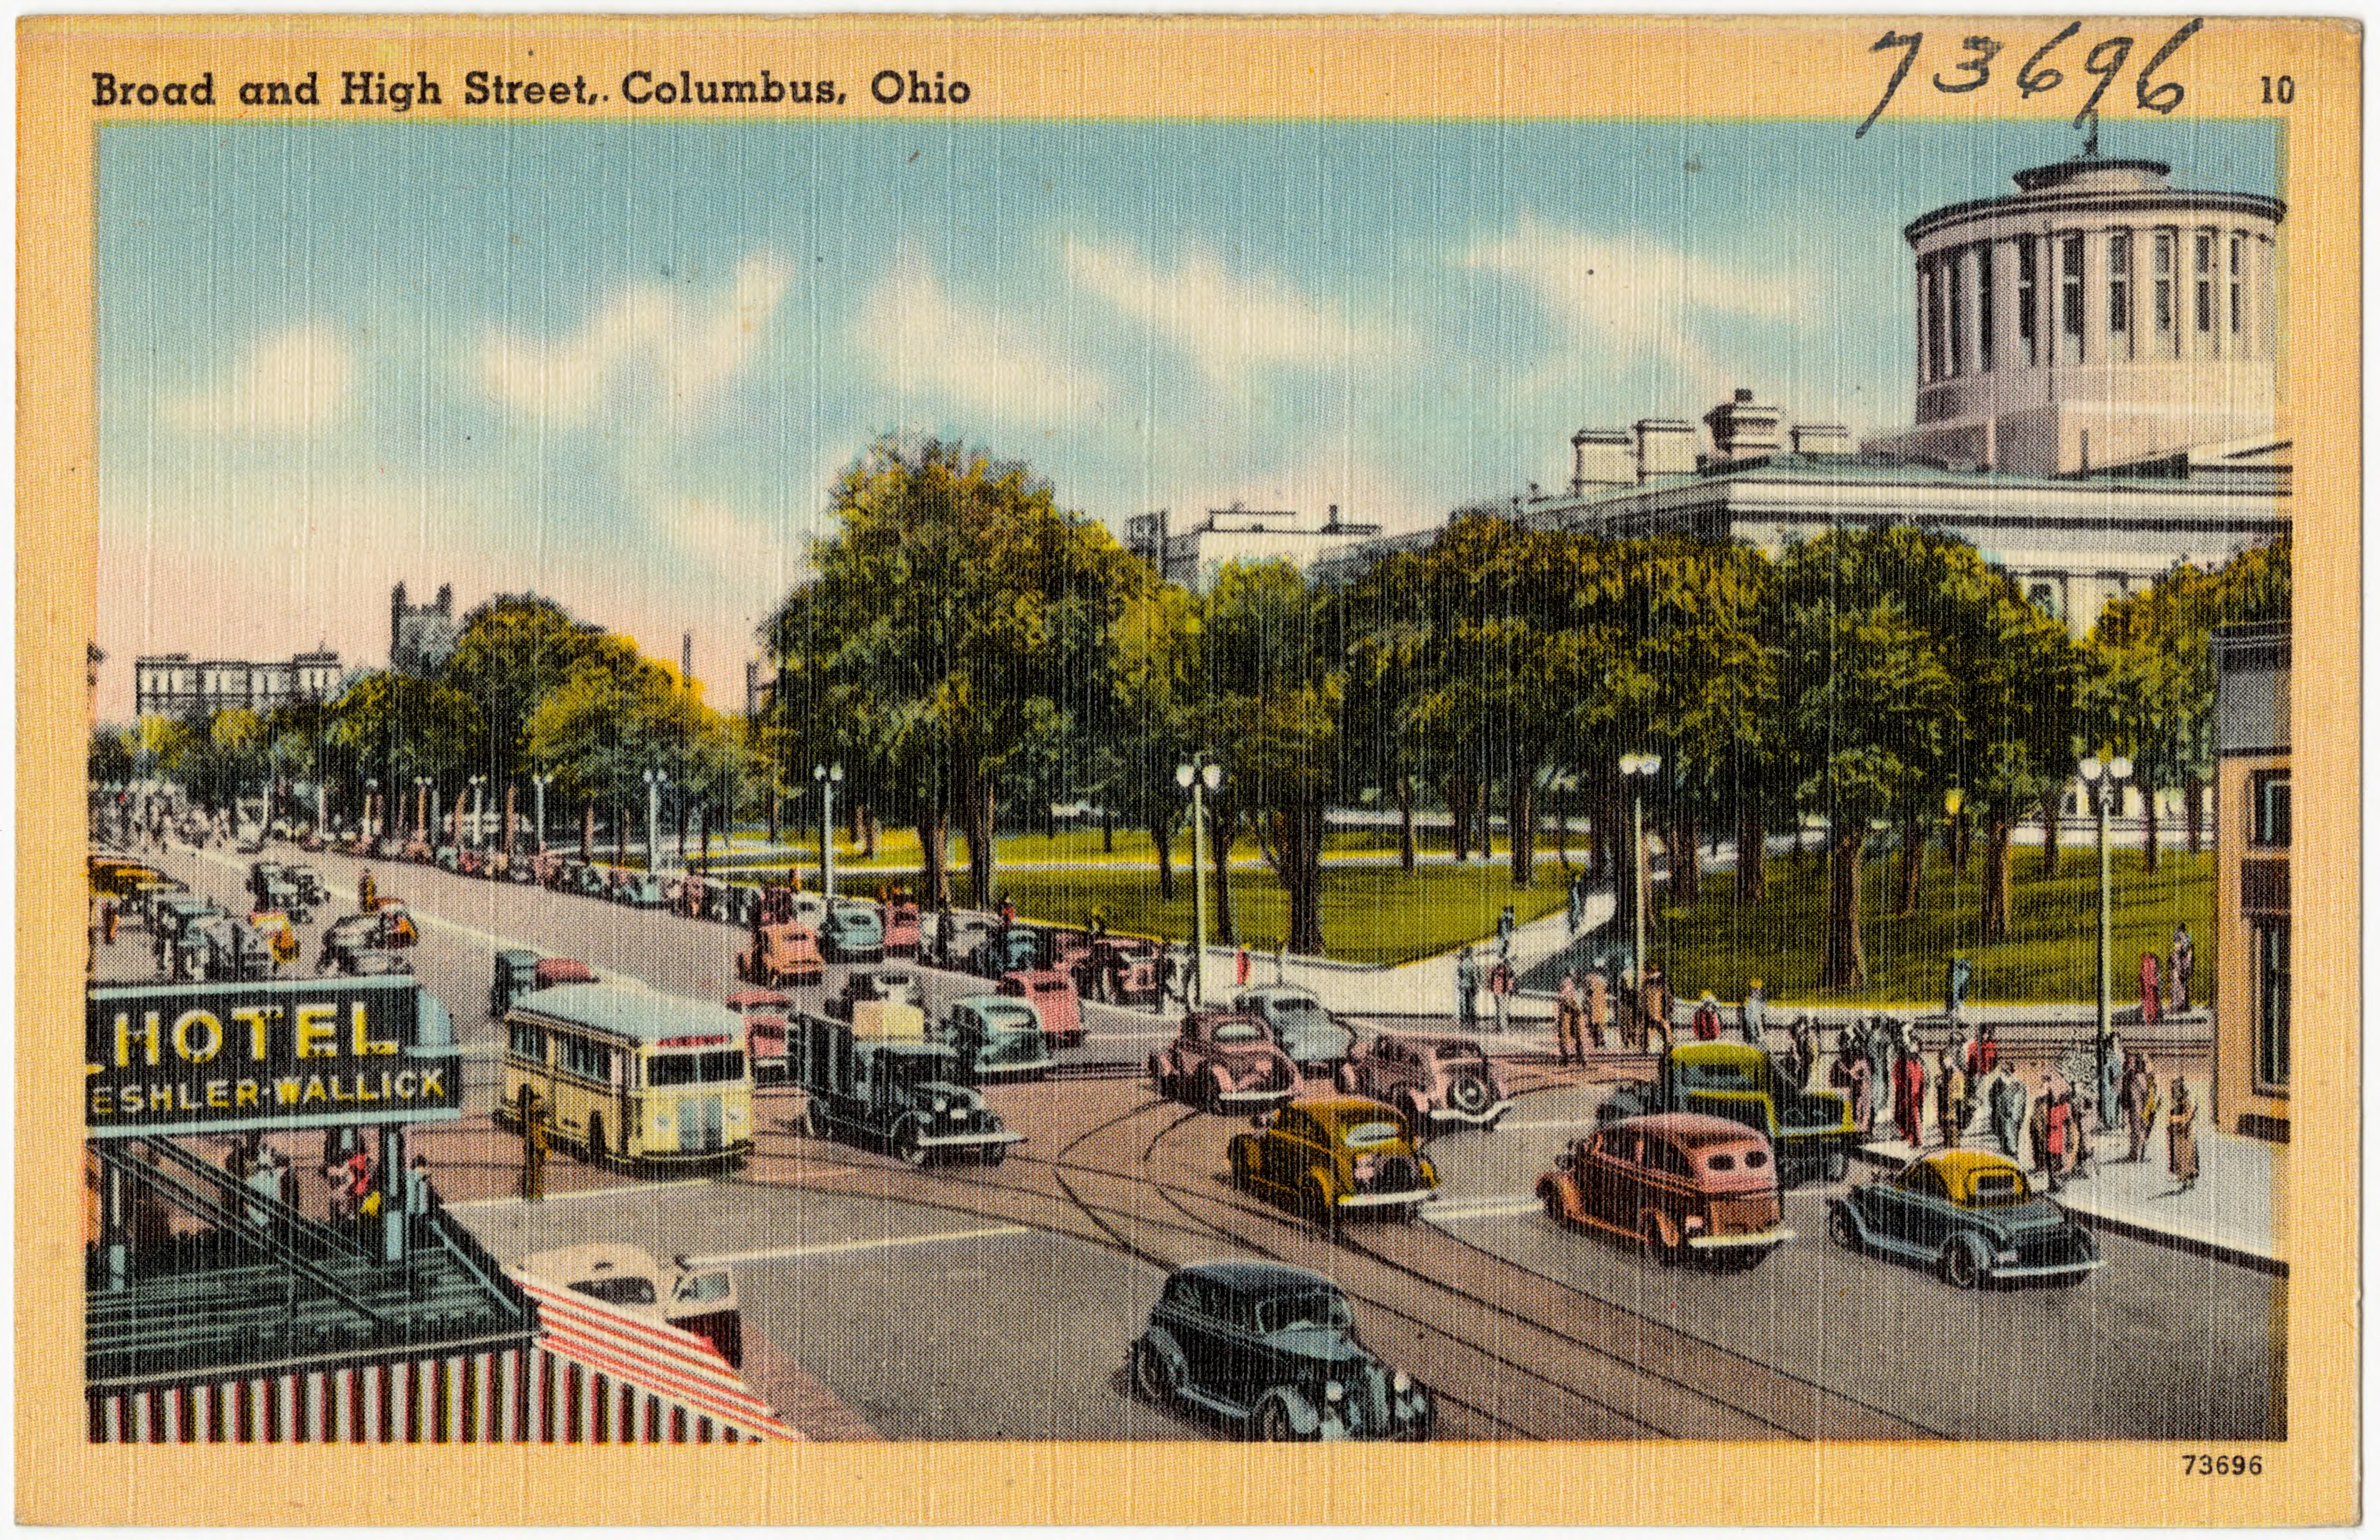 File:Broad and High Street, Columbus, Ohio (73696) jpg